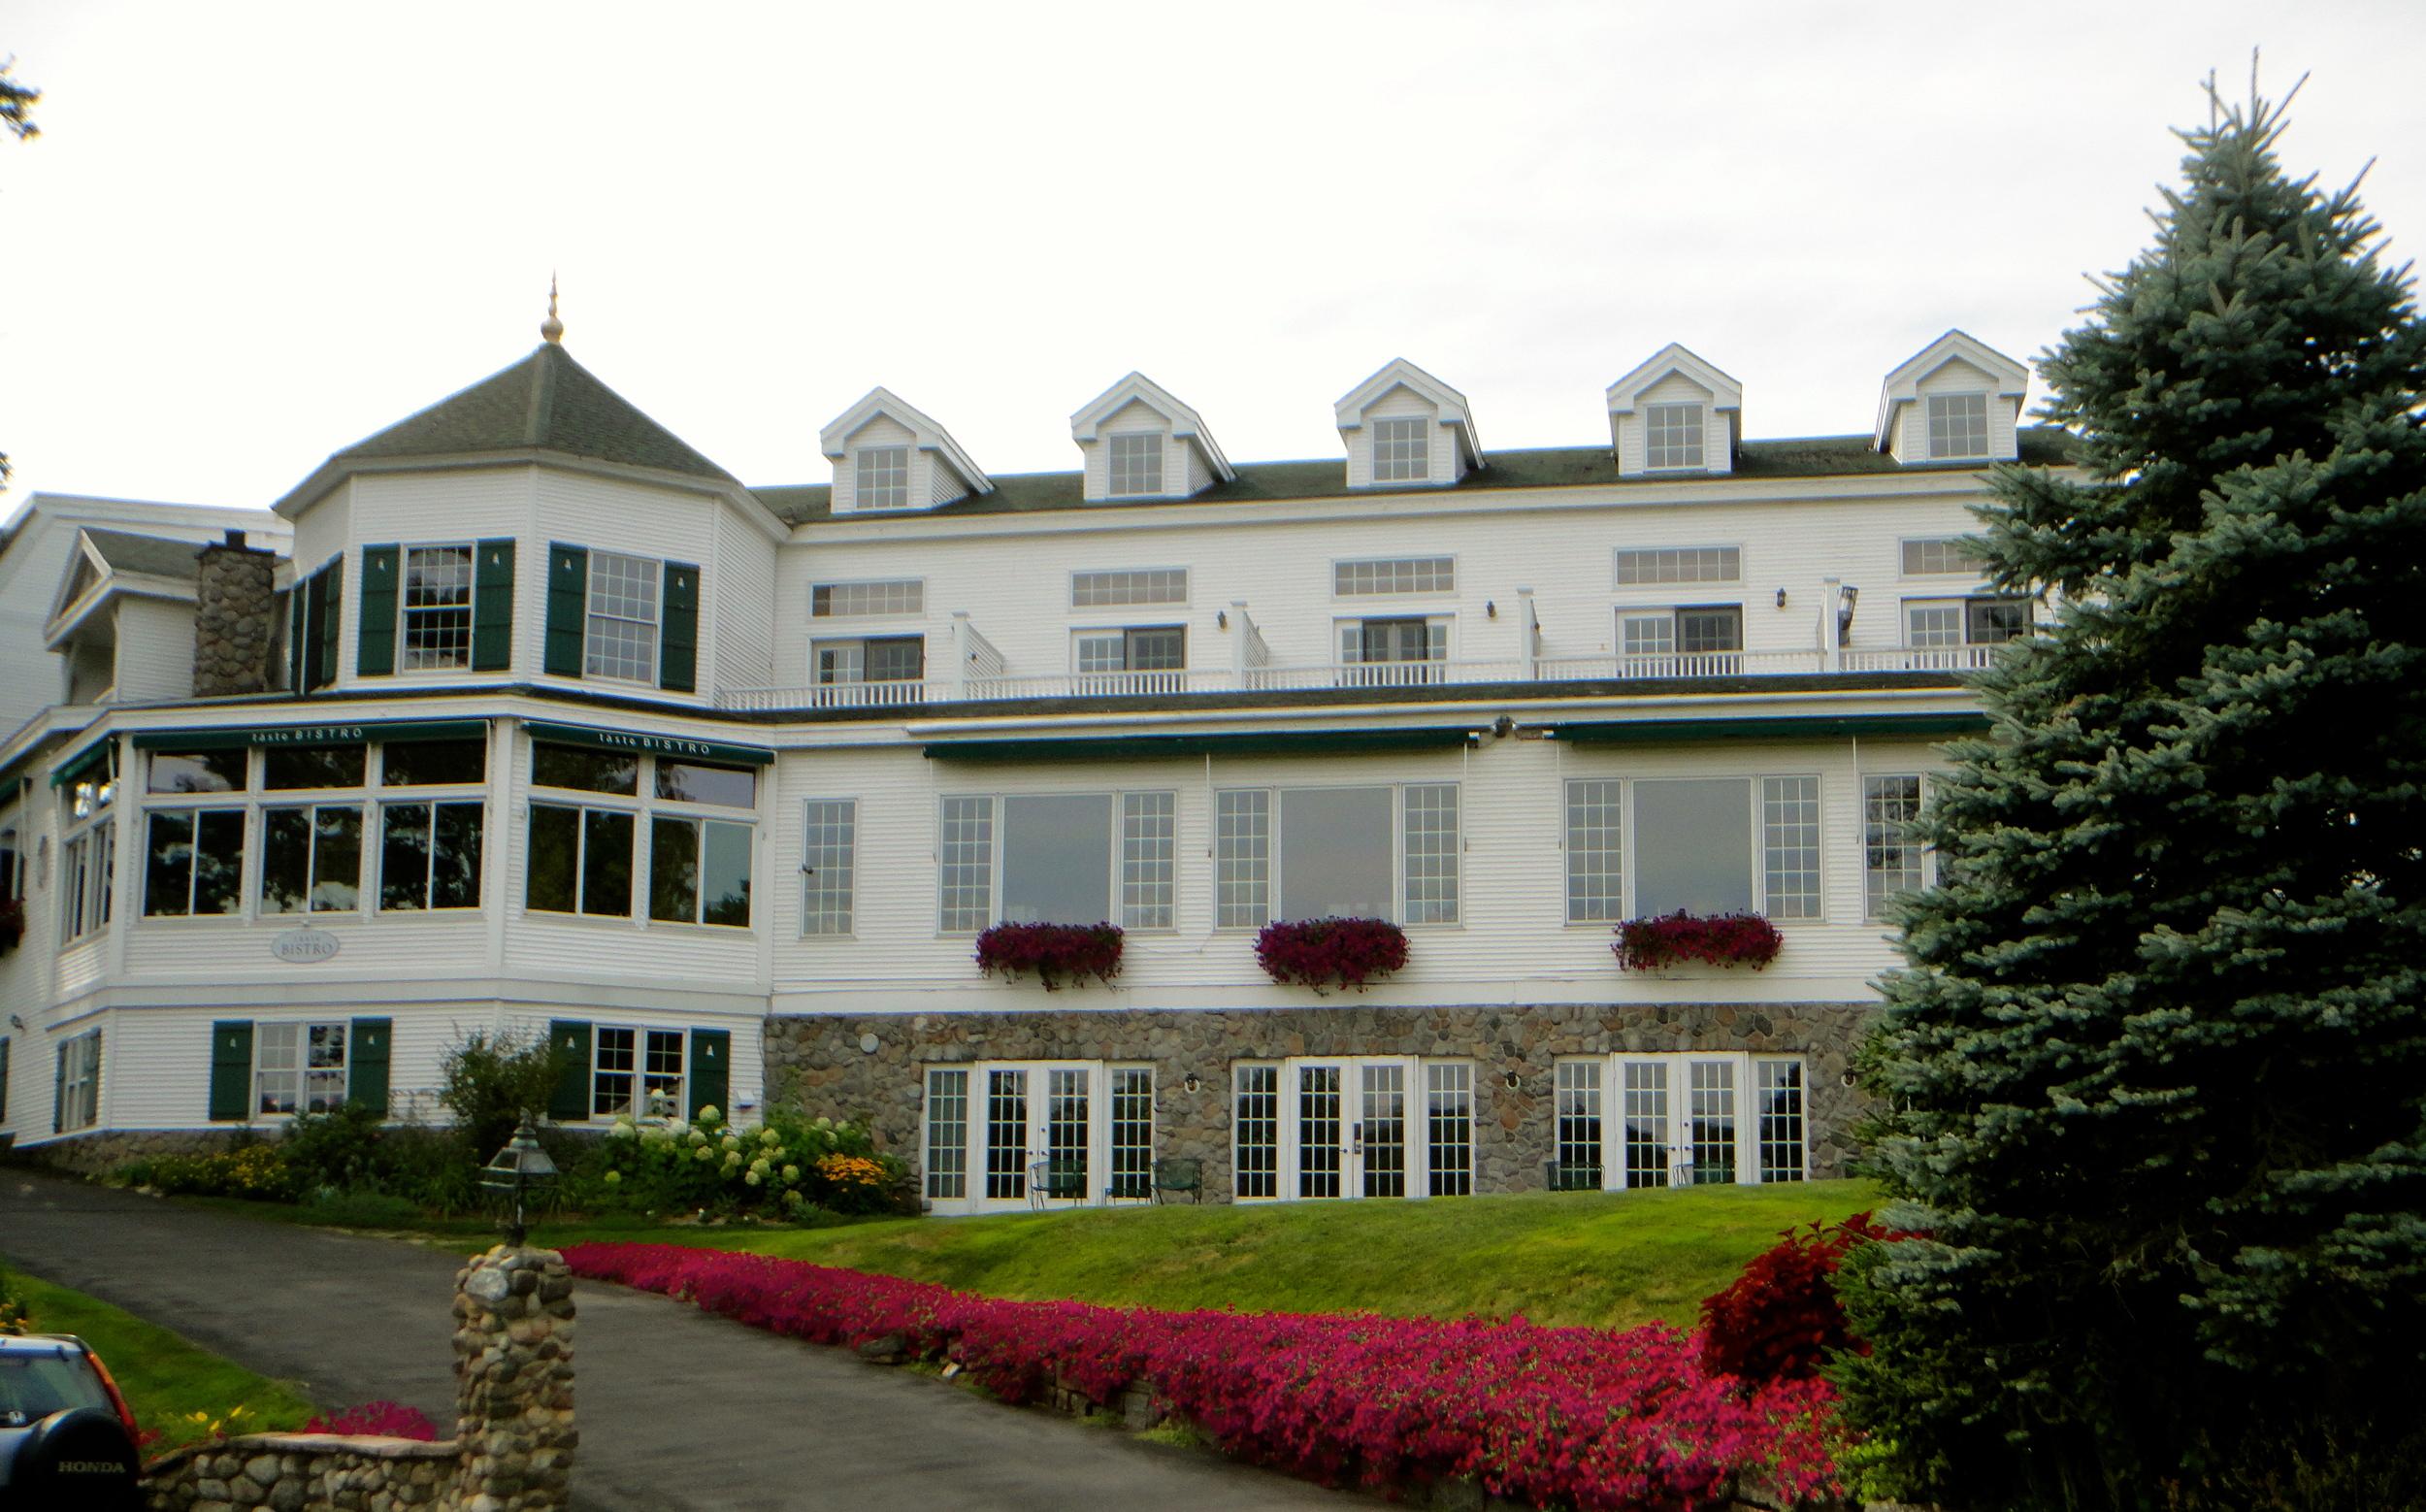 Facade of Mirror Lake Inn, Lake Placid